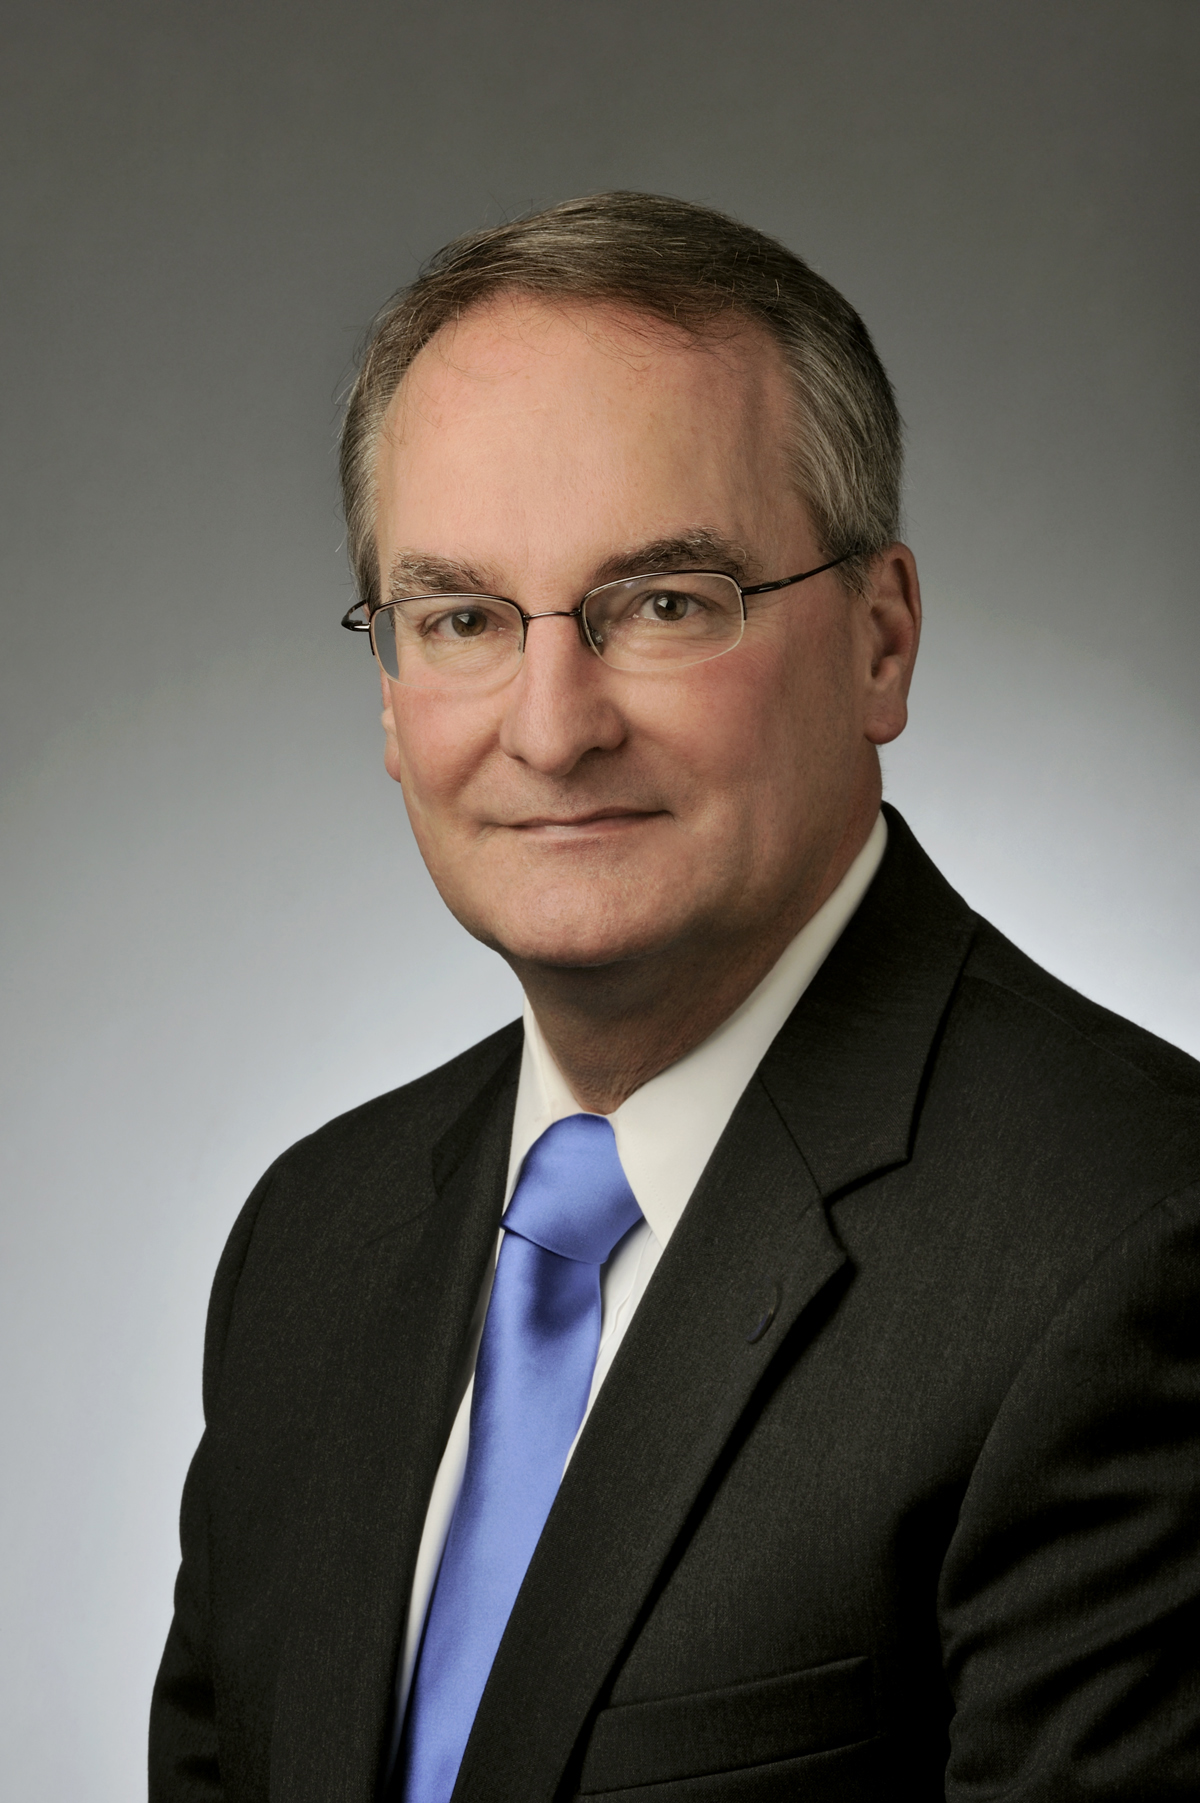 John Y. Walz, Ph.D. Named President of Milwaukee School of ...